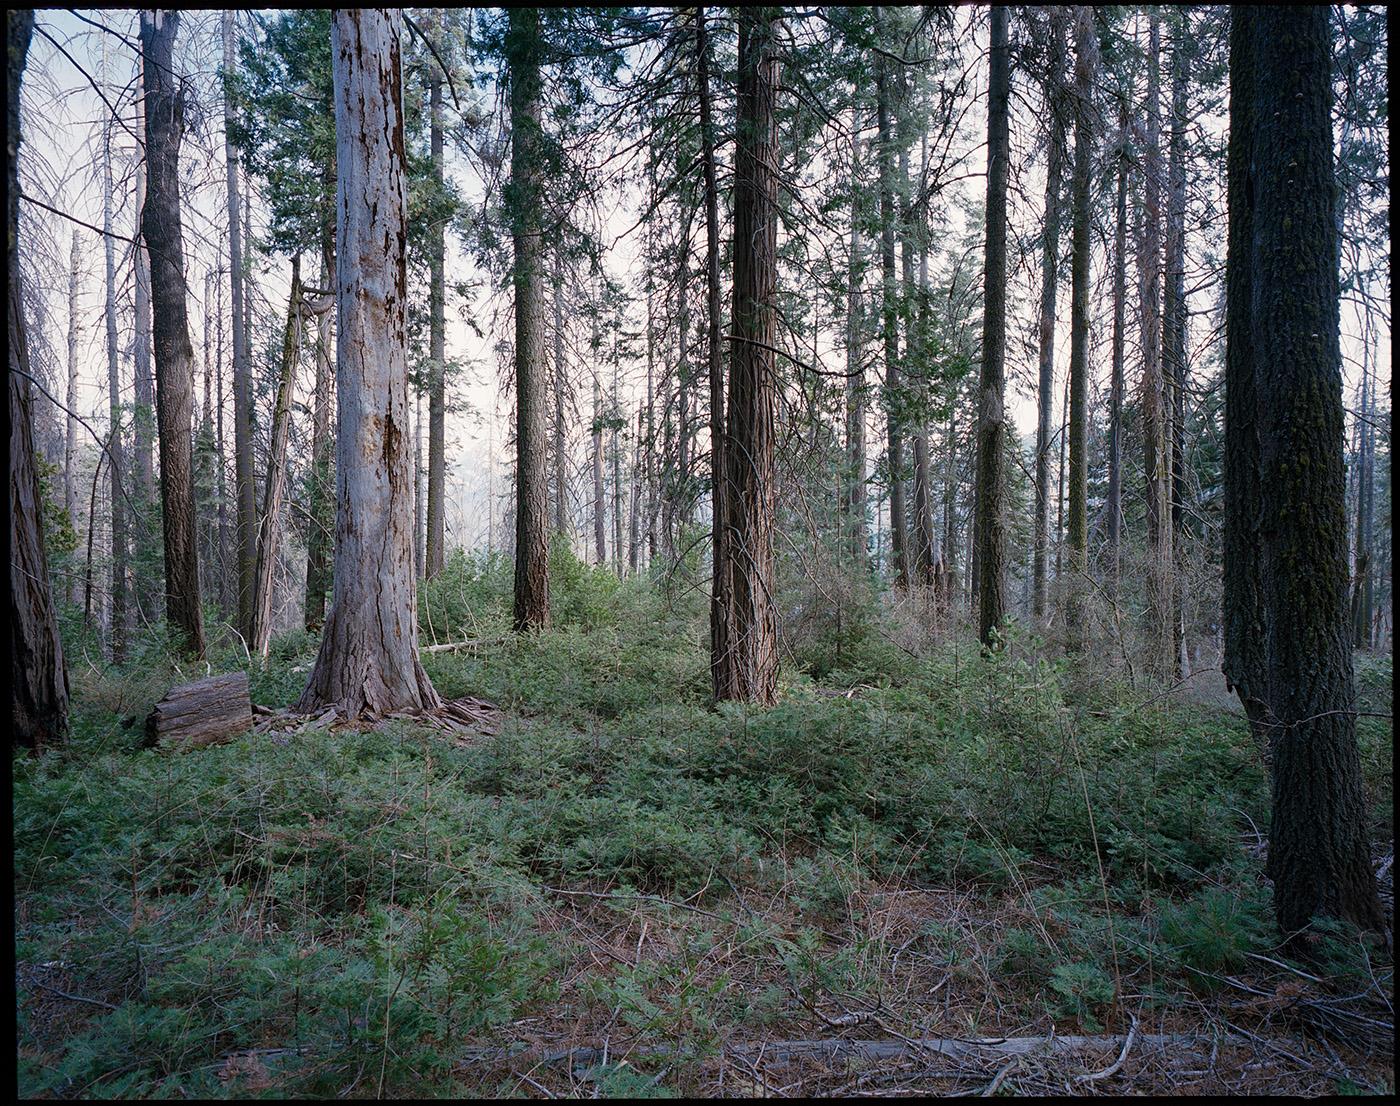 Deborah_Farnault_Sequoia_2018_09.jpg